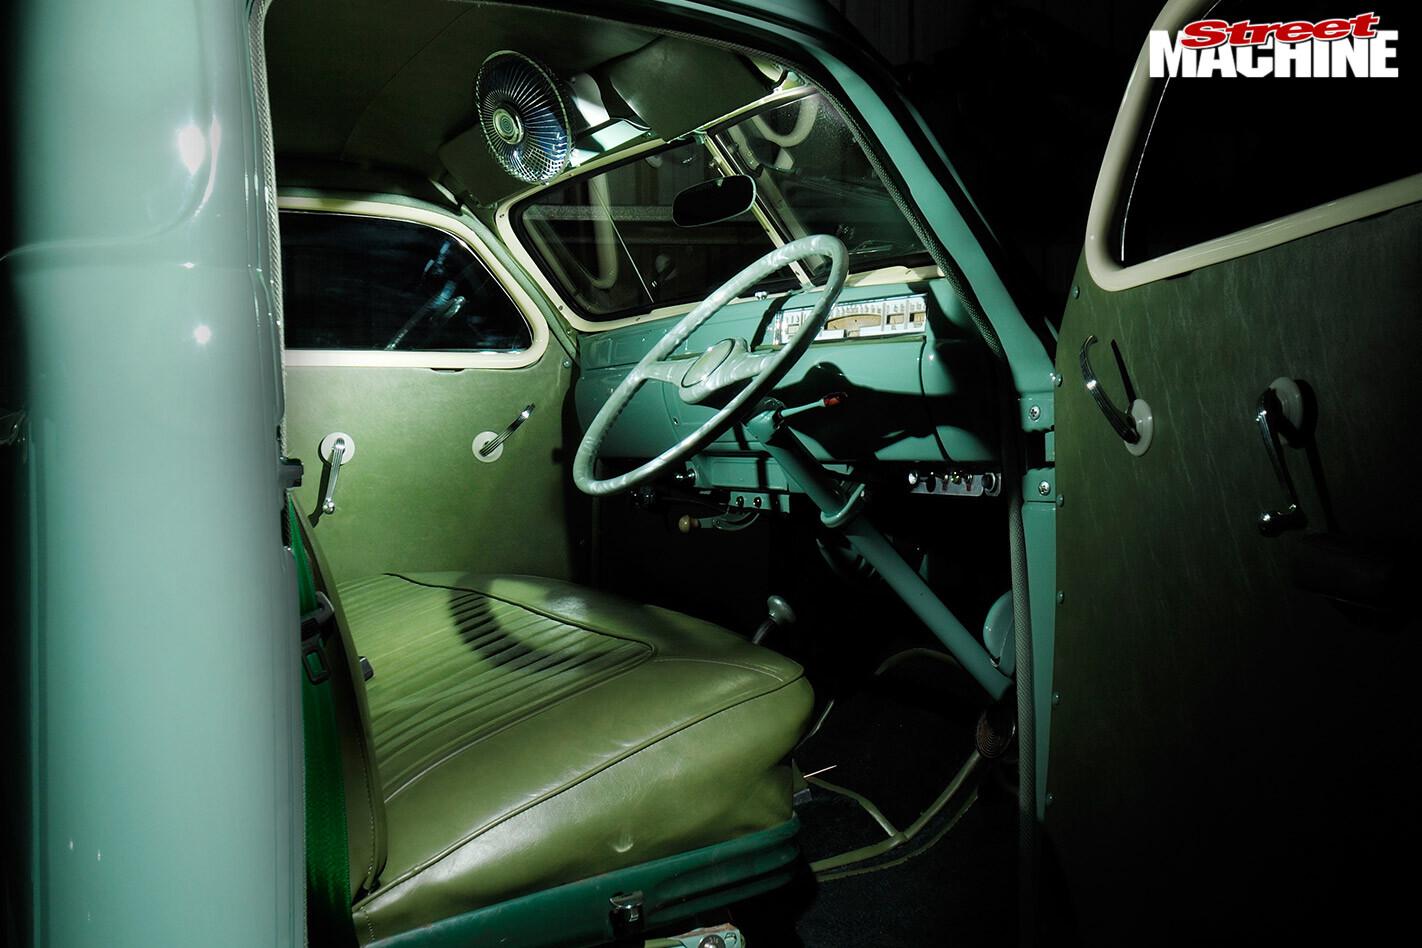 1948 Studebaker M5 pickup interior